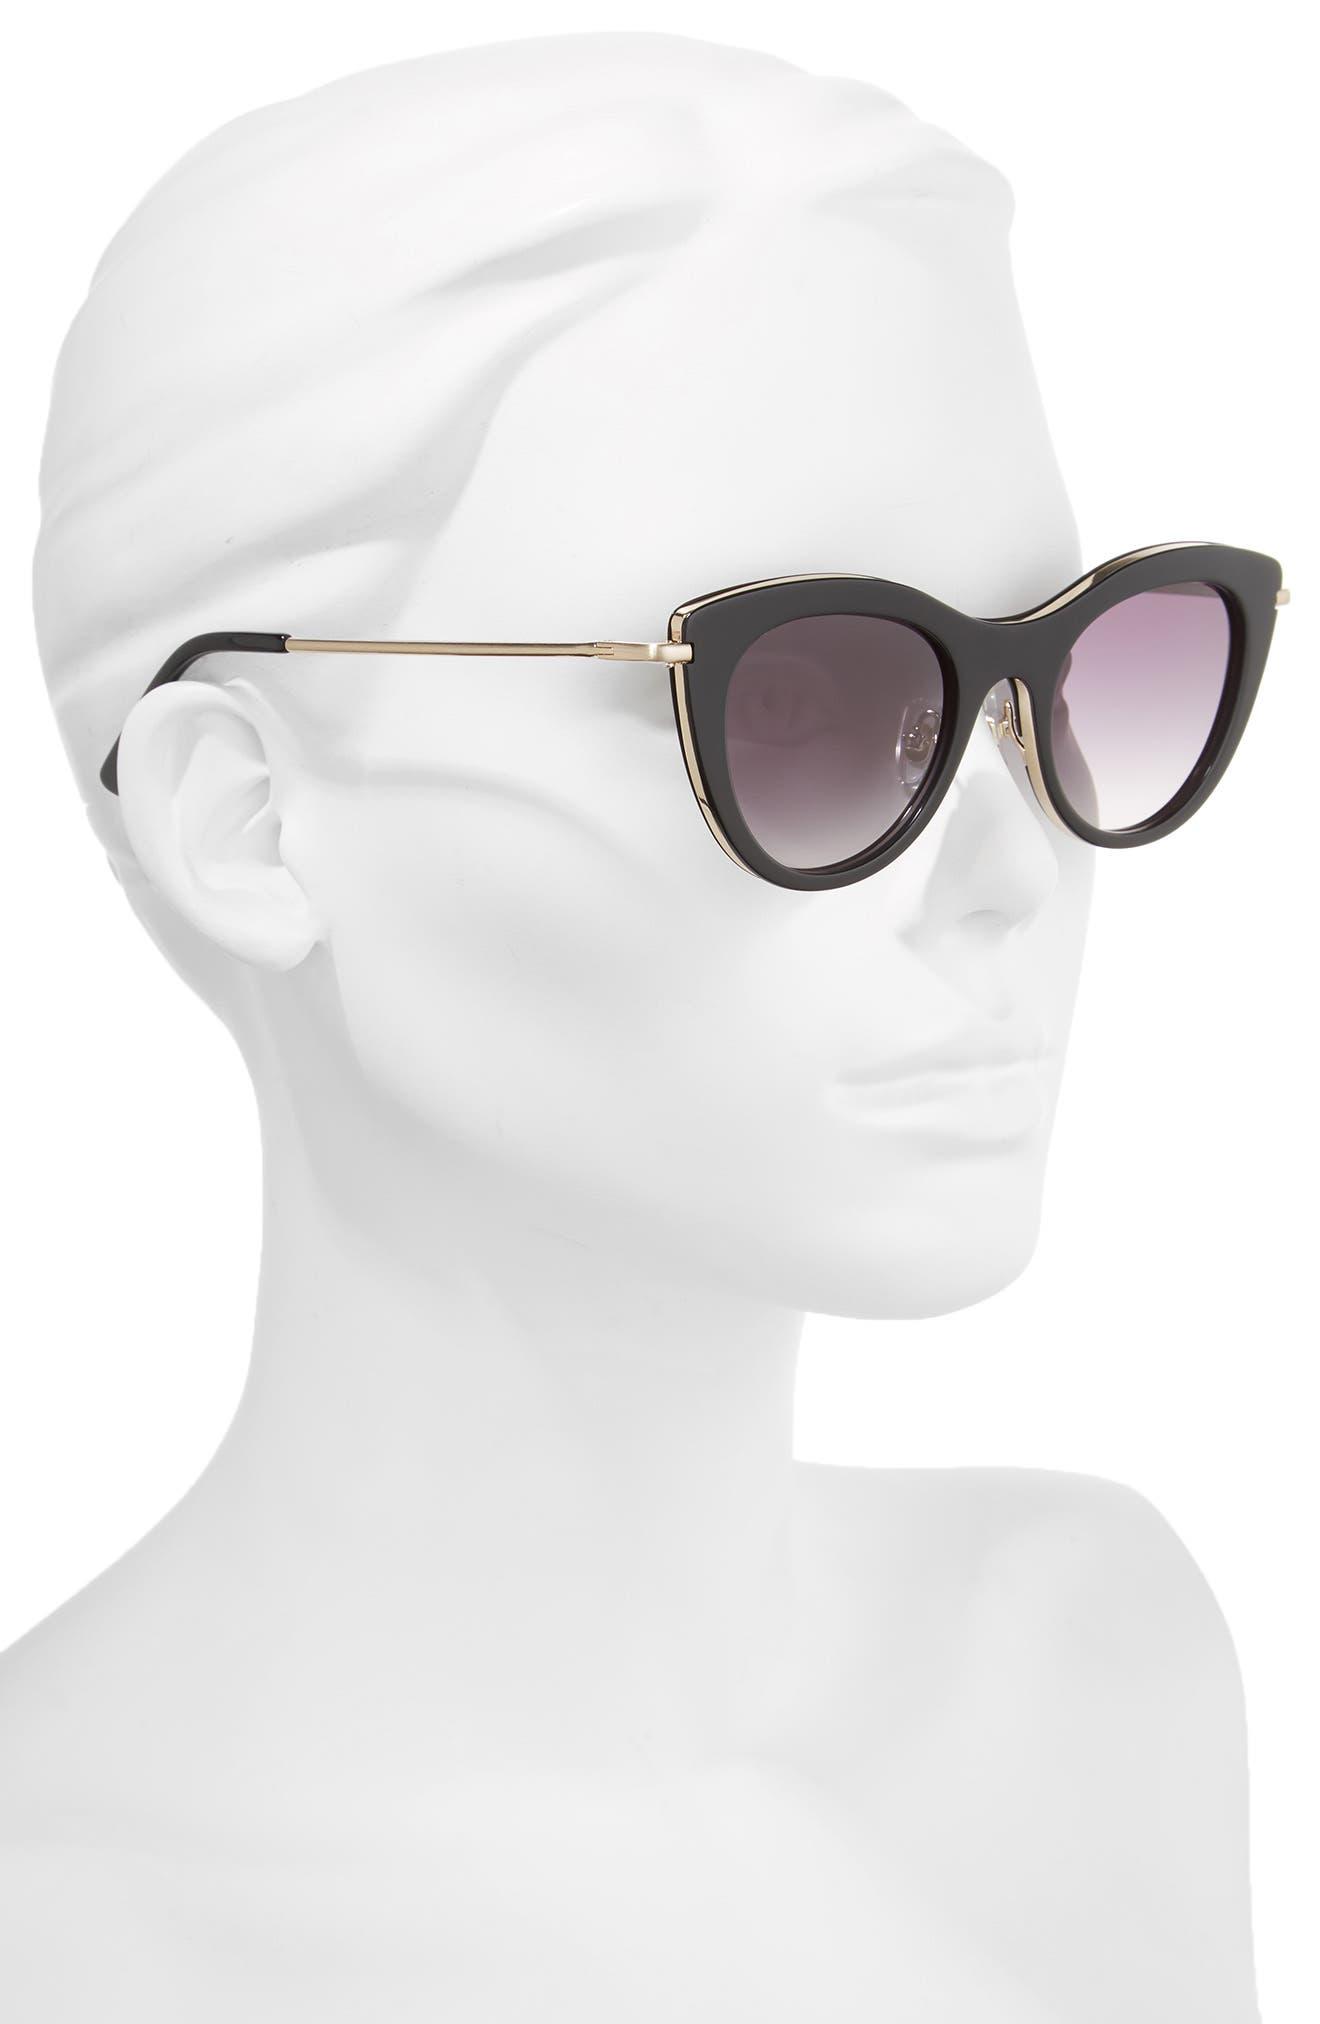 Gansevoort 48mm Special Fit Cat Eye Sunglasses,                             Alternate thumbnail 2, color,                             001